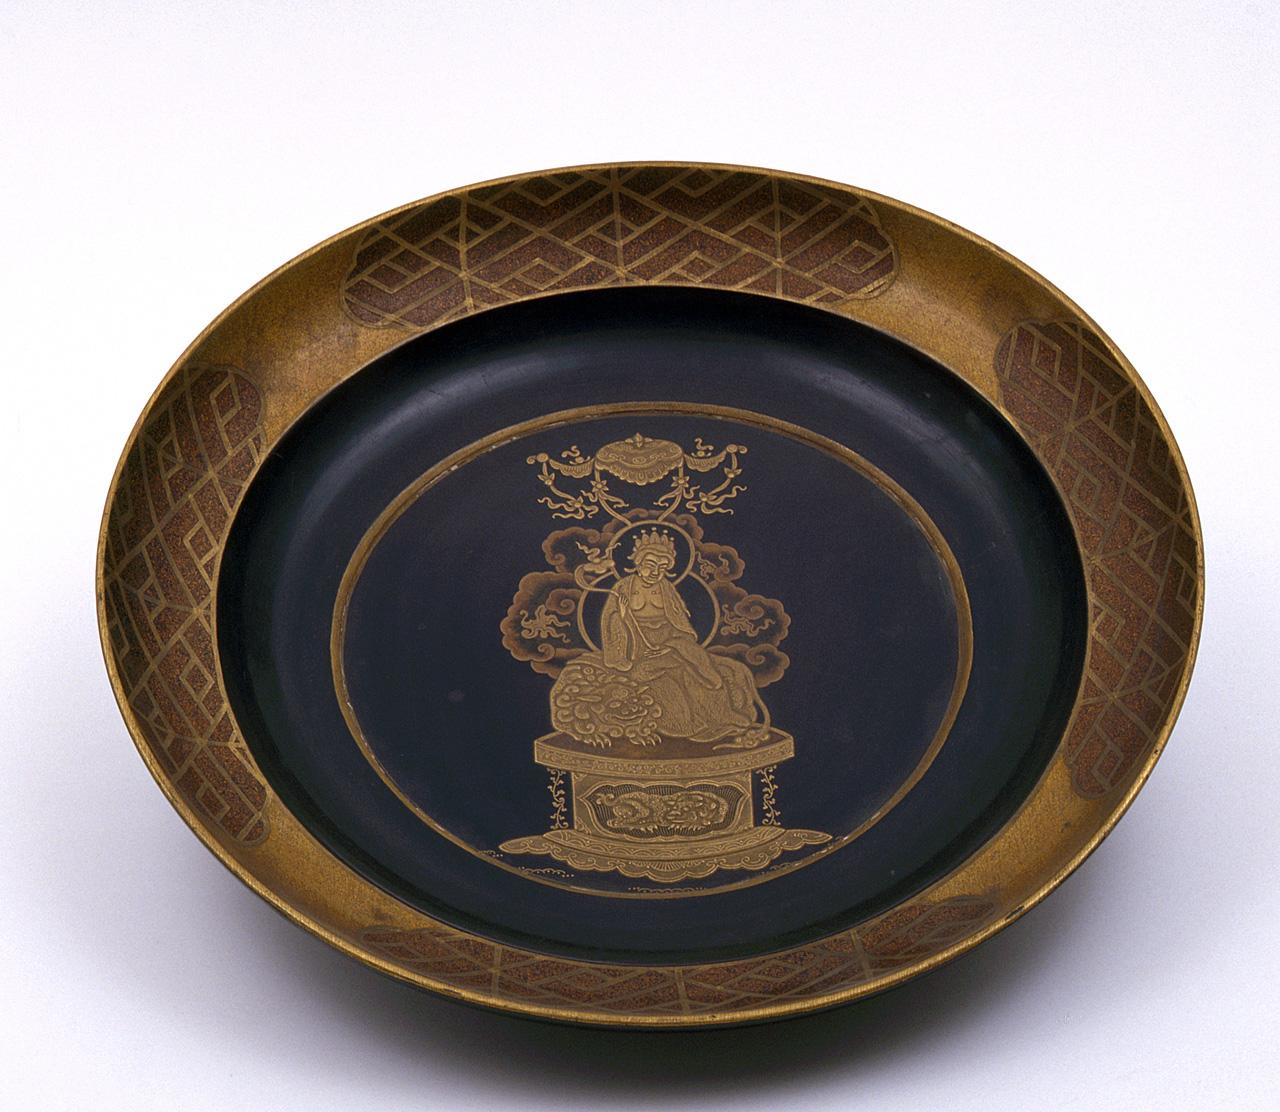 Budda (piatto) - manifattura giapponese (sec. XVII)